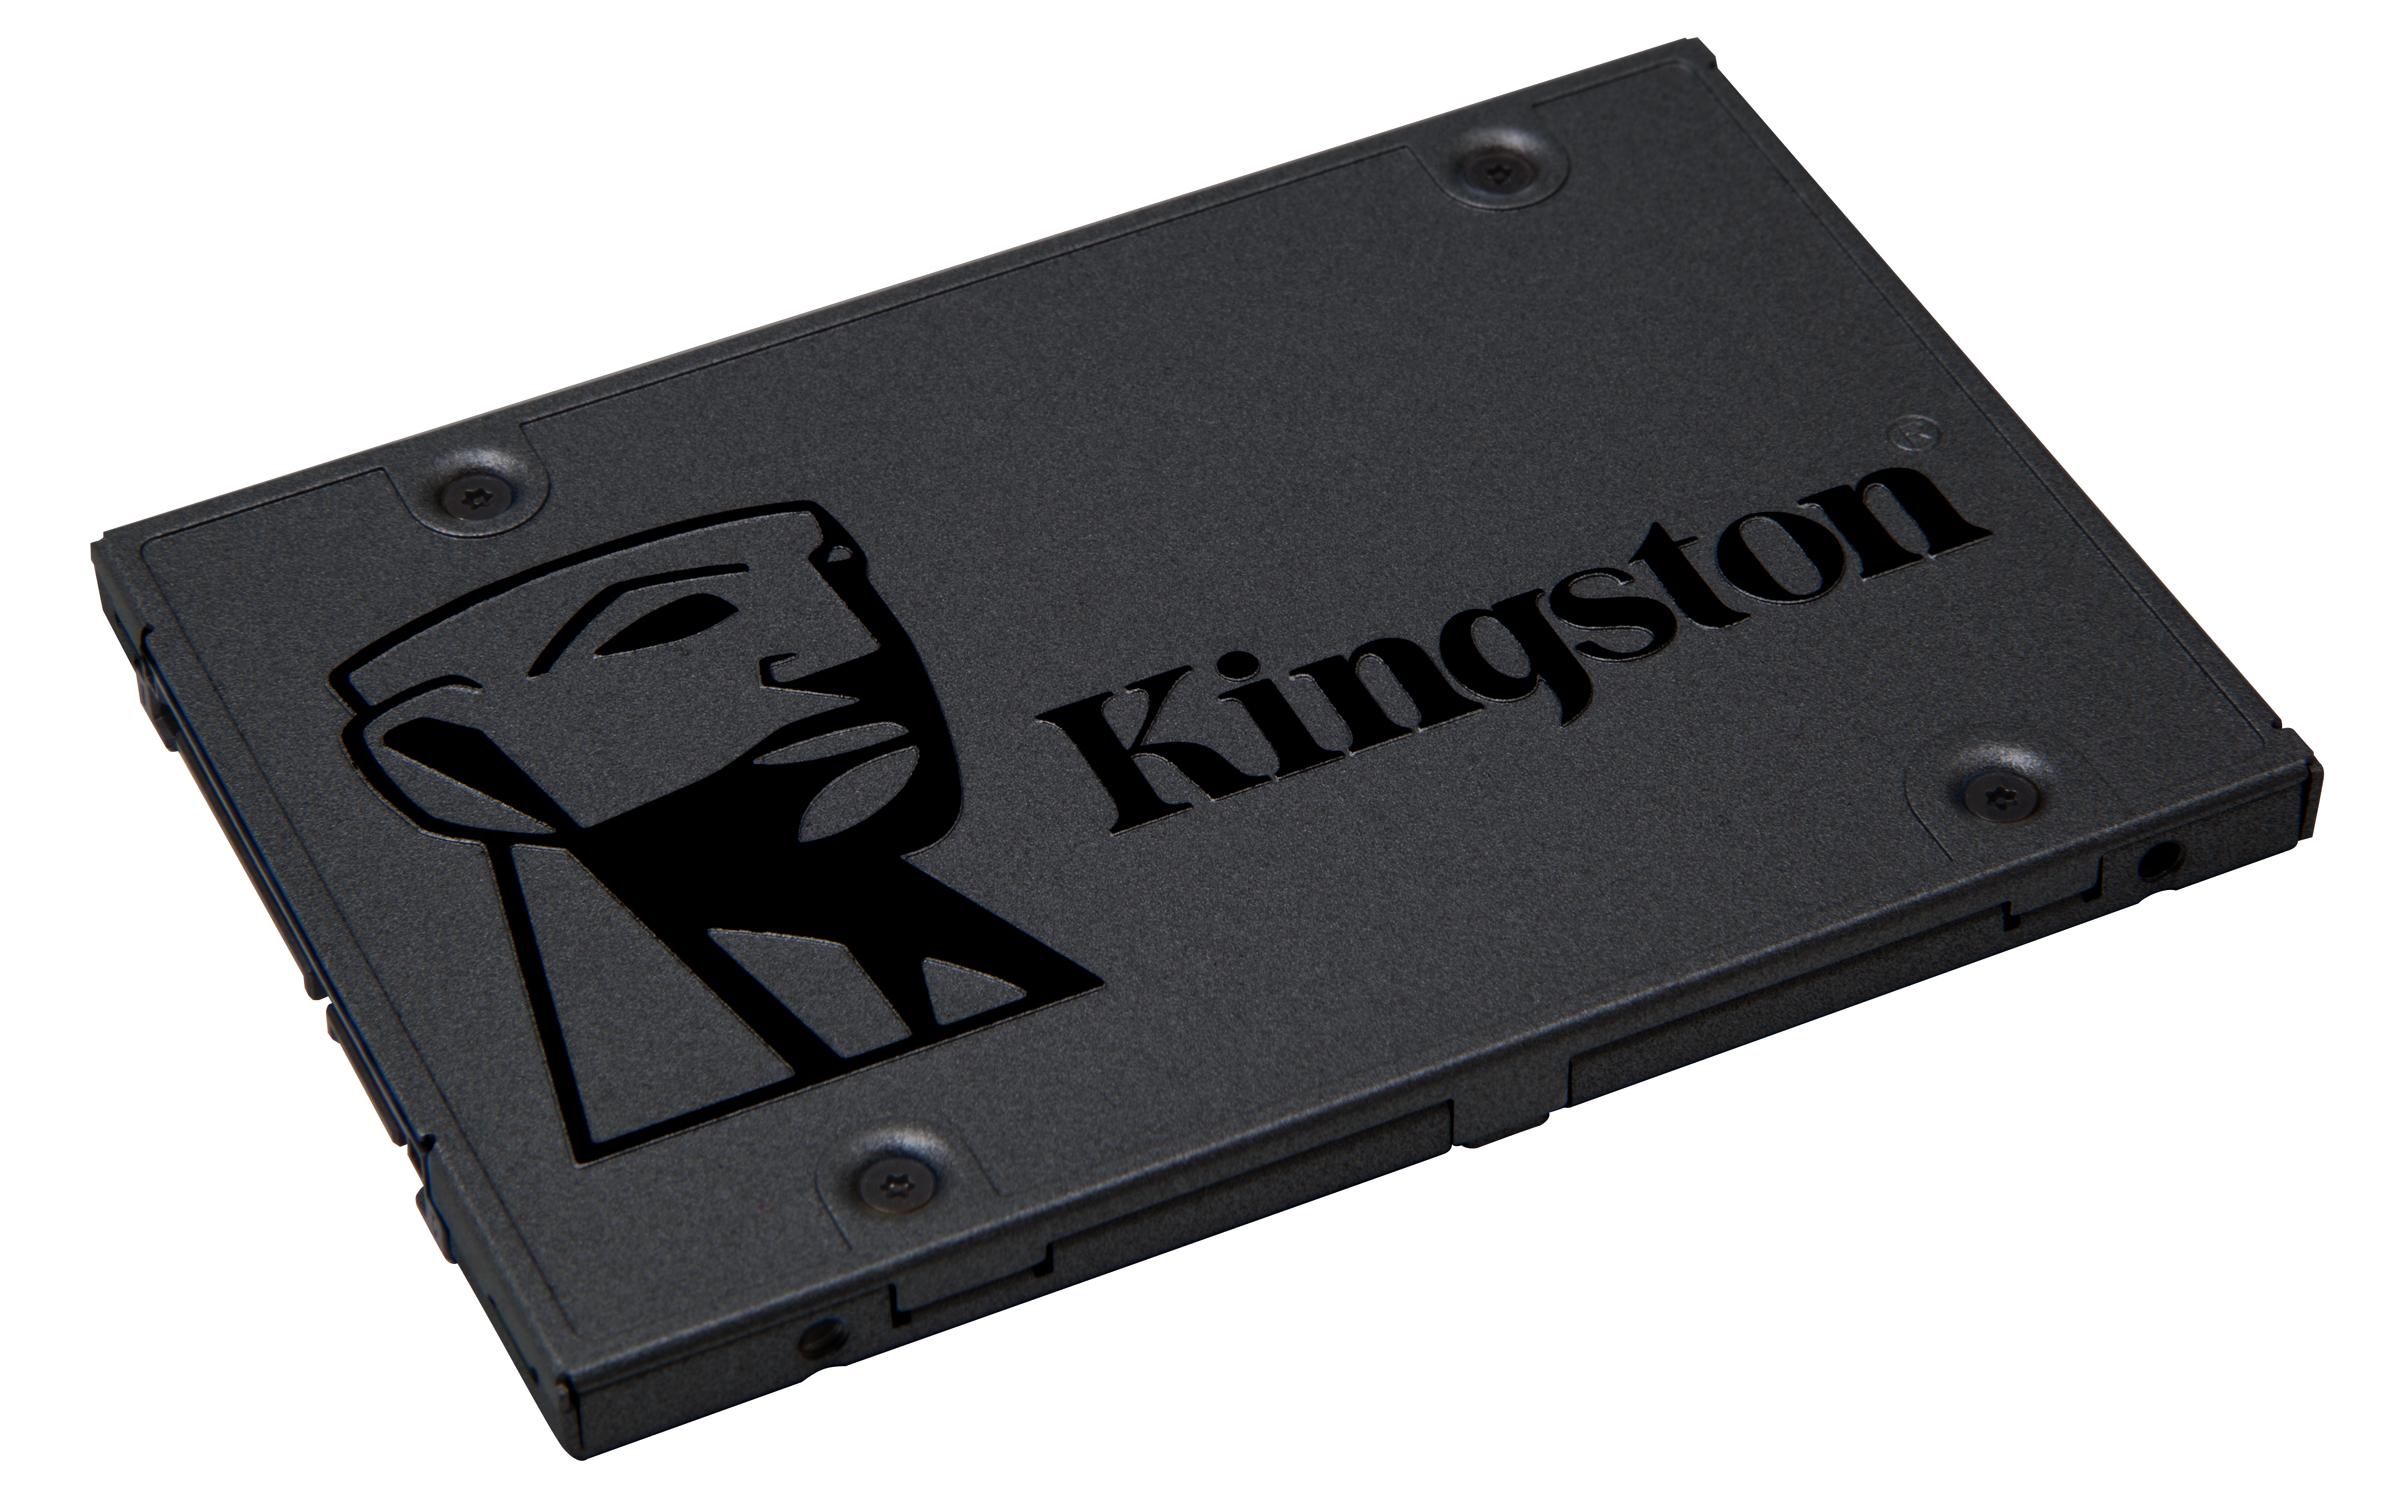 Kingston A400 SSD 120GB Serial ATA III  SA400S37/120G - eet01